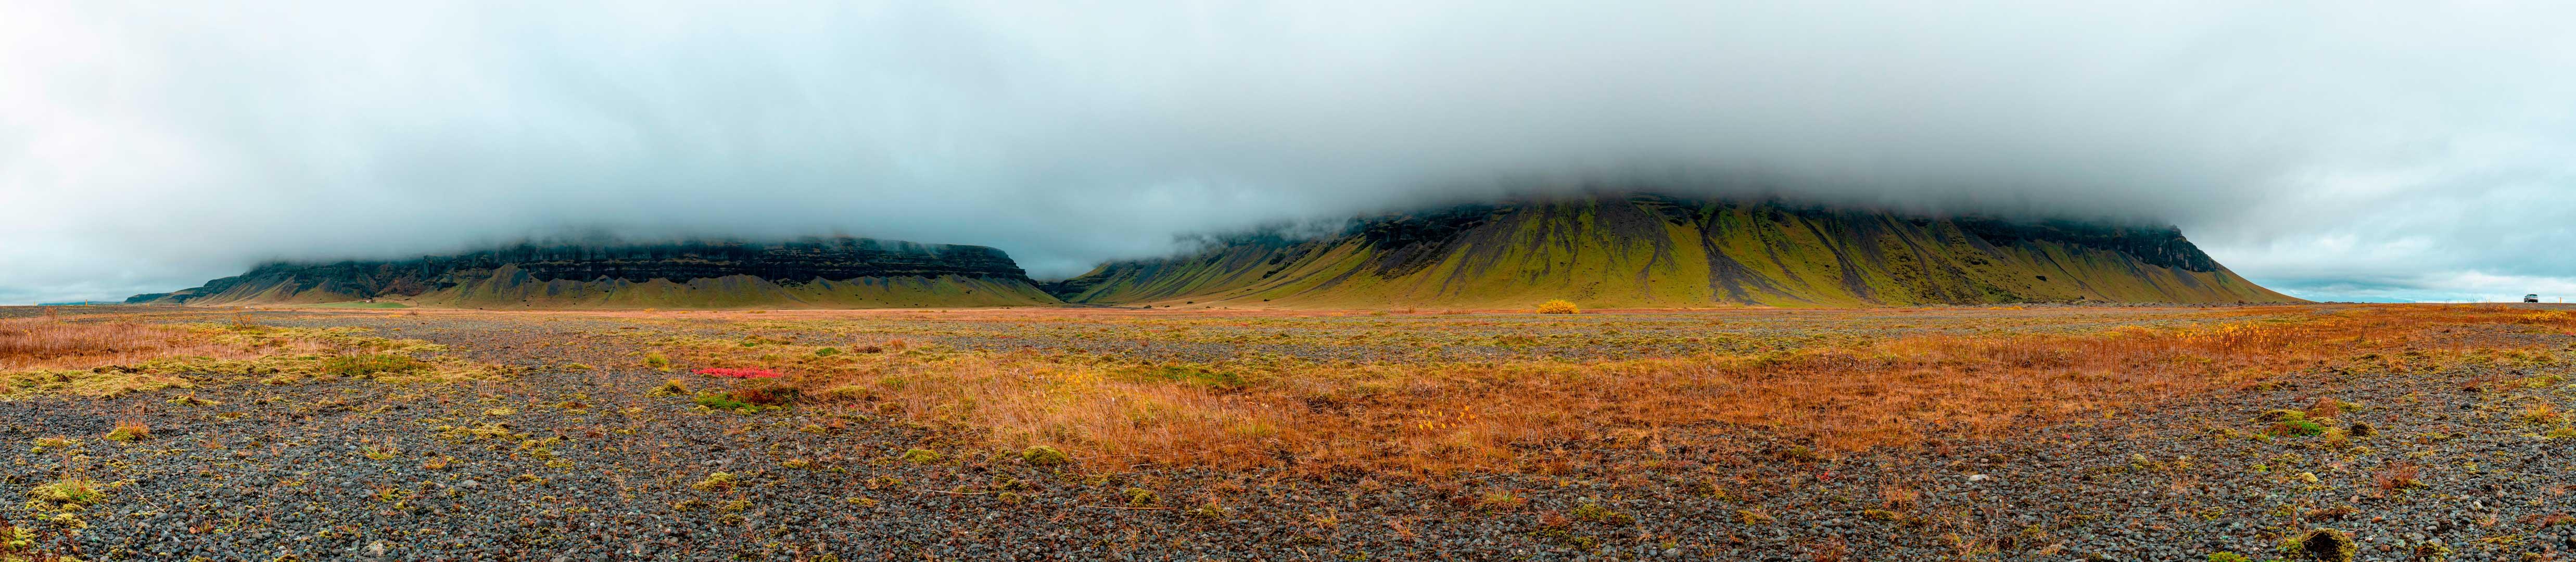 Montagnes islandaises